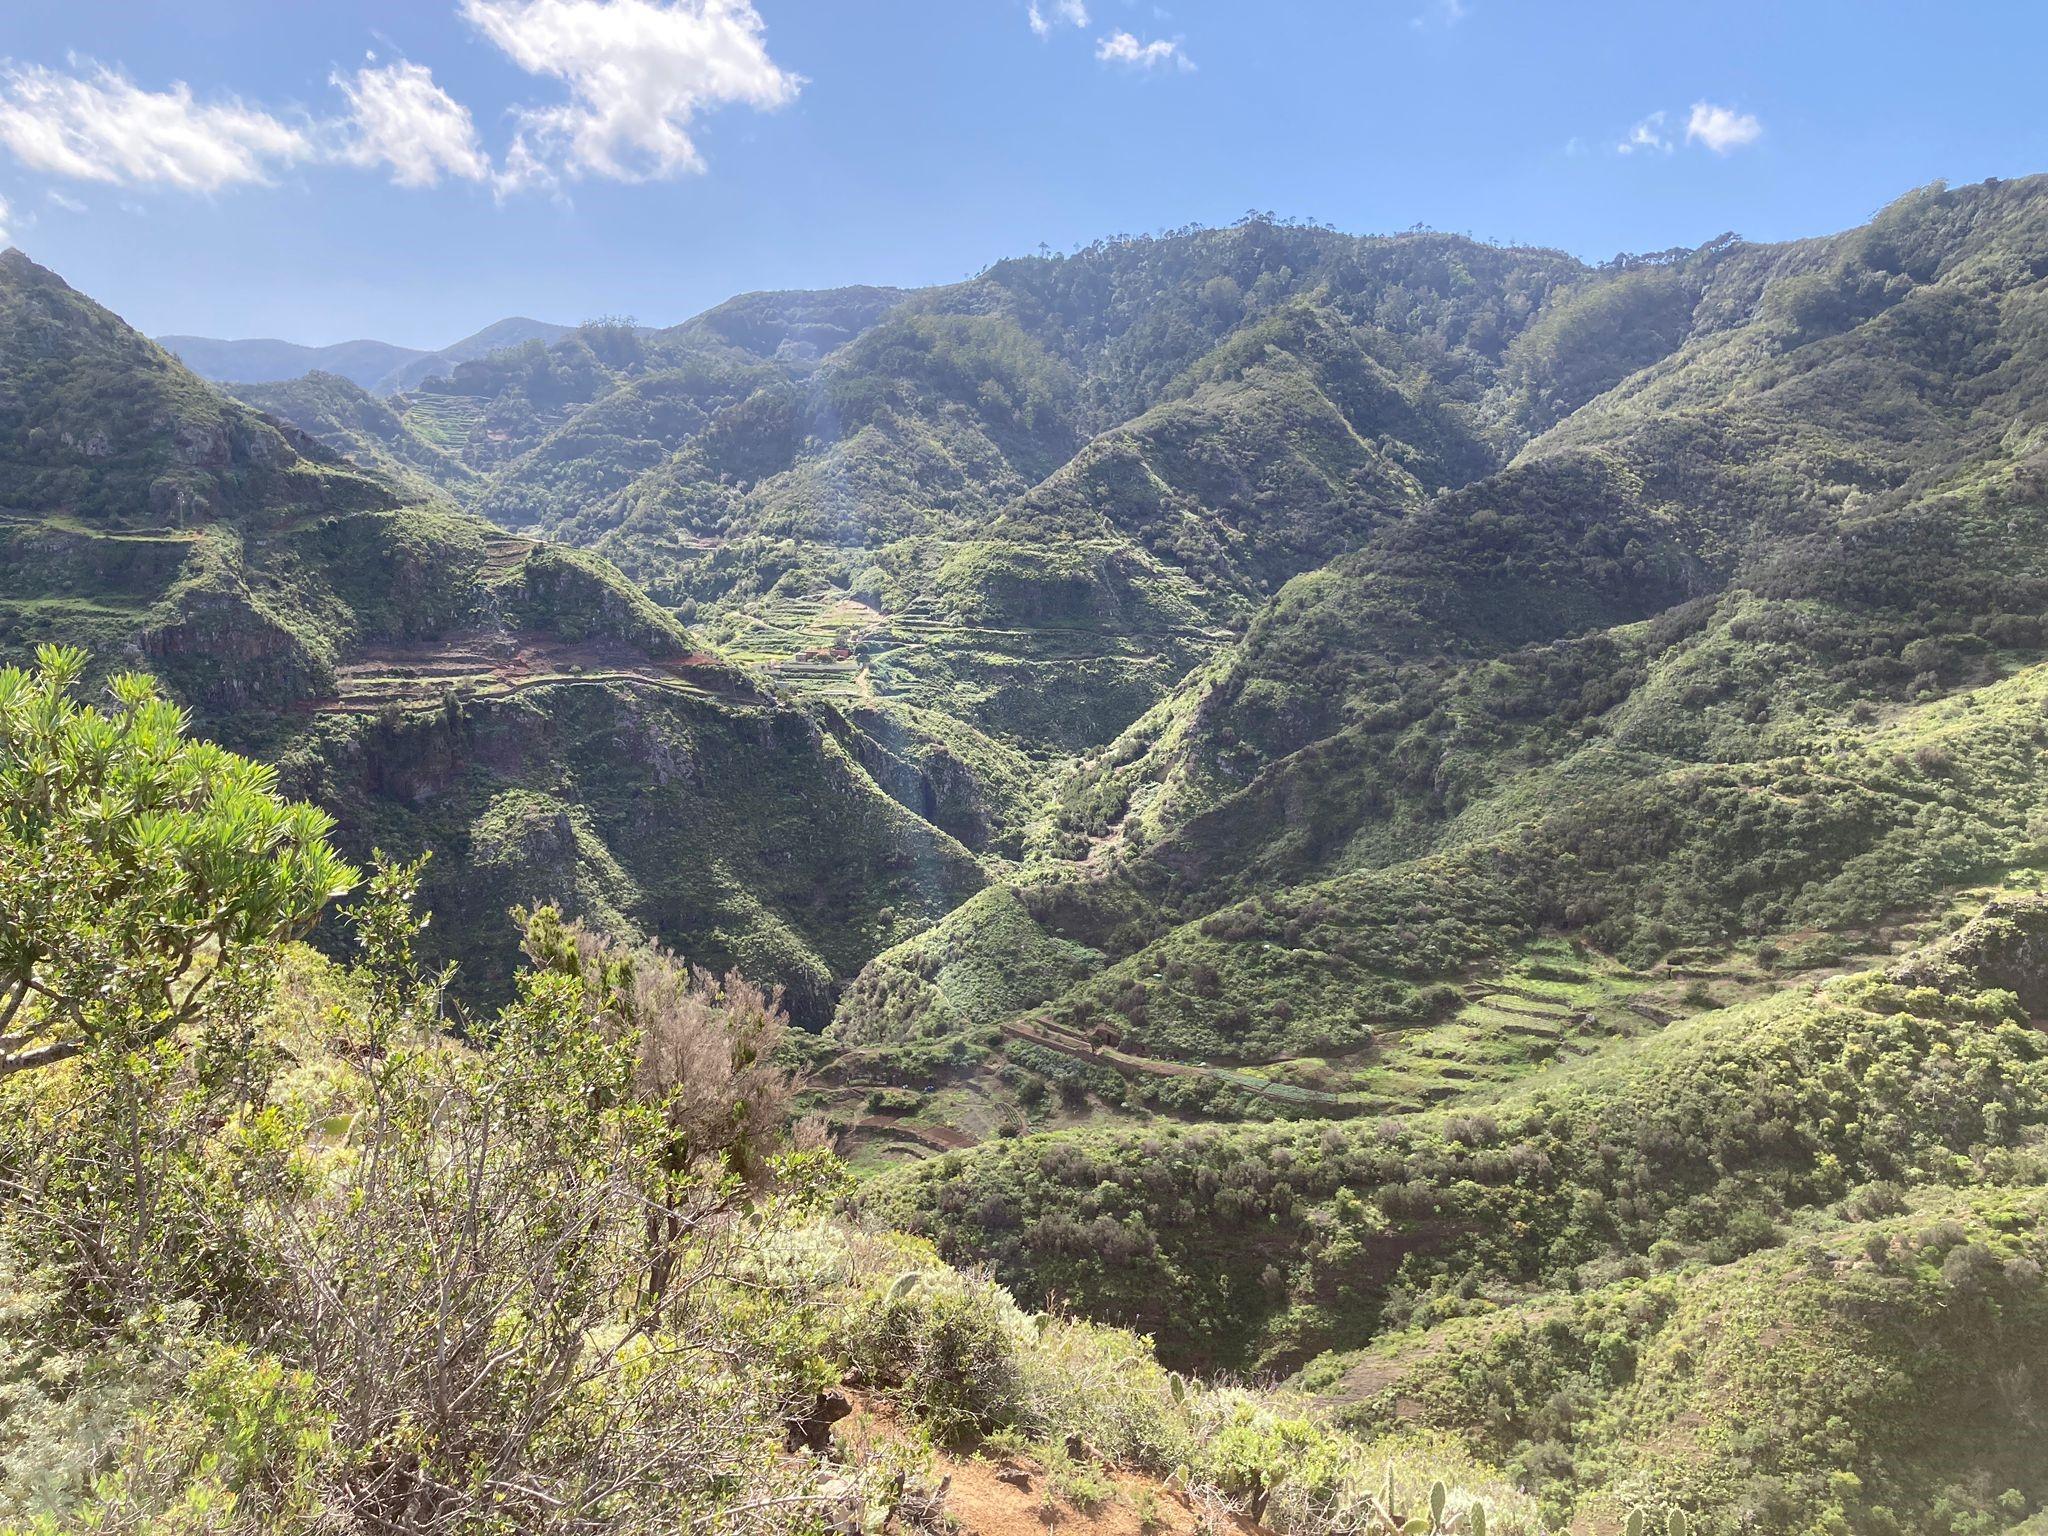 Wanderung Punta del Hidalgo Batán